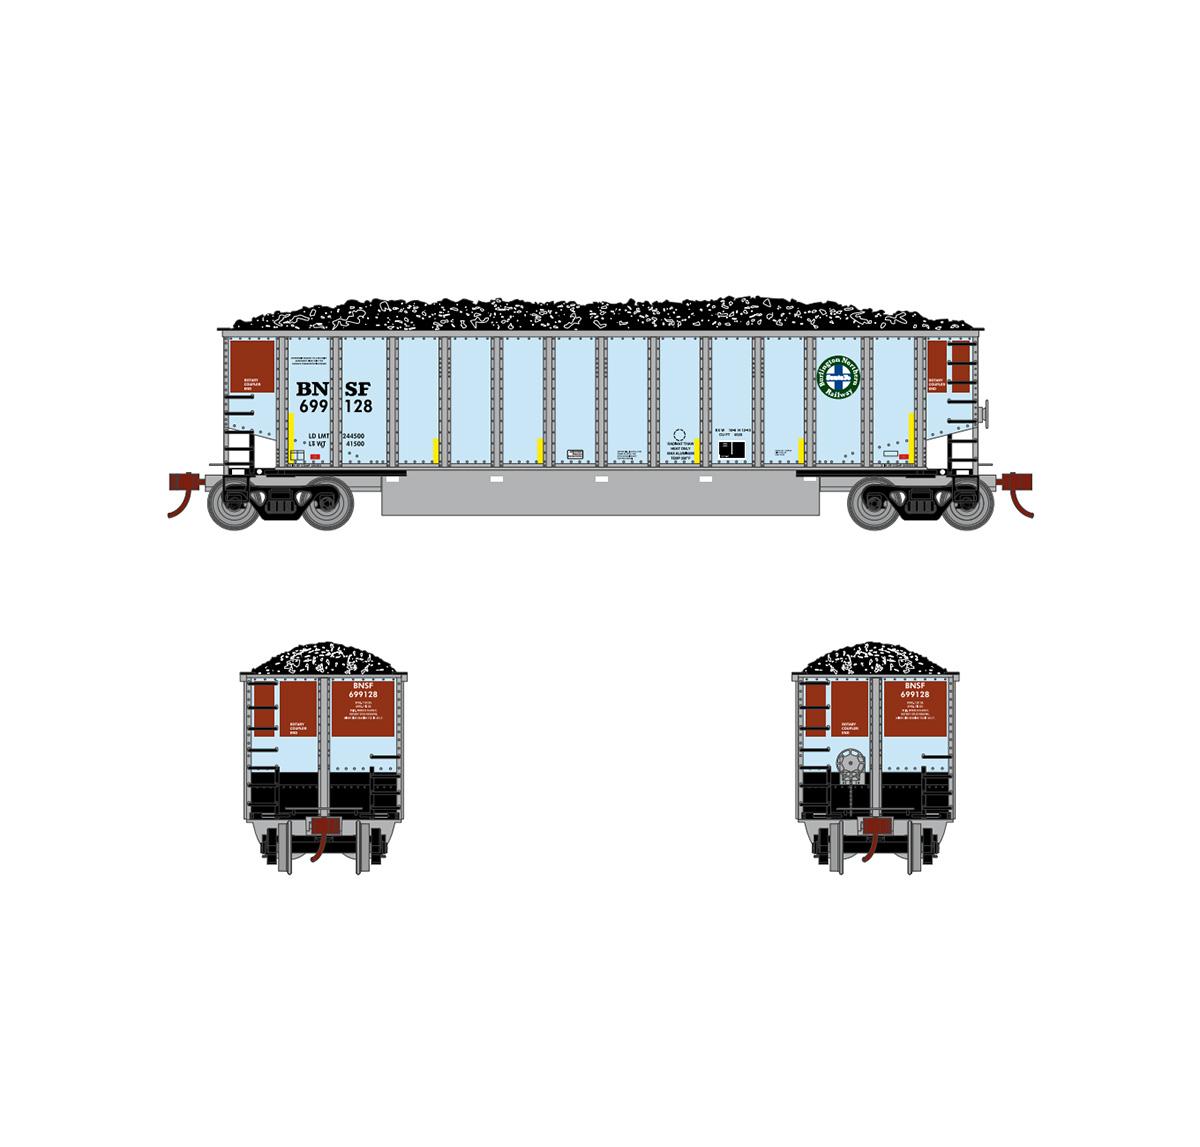 athearn_bethgon_coalporter_w-load_bnsf_699128